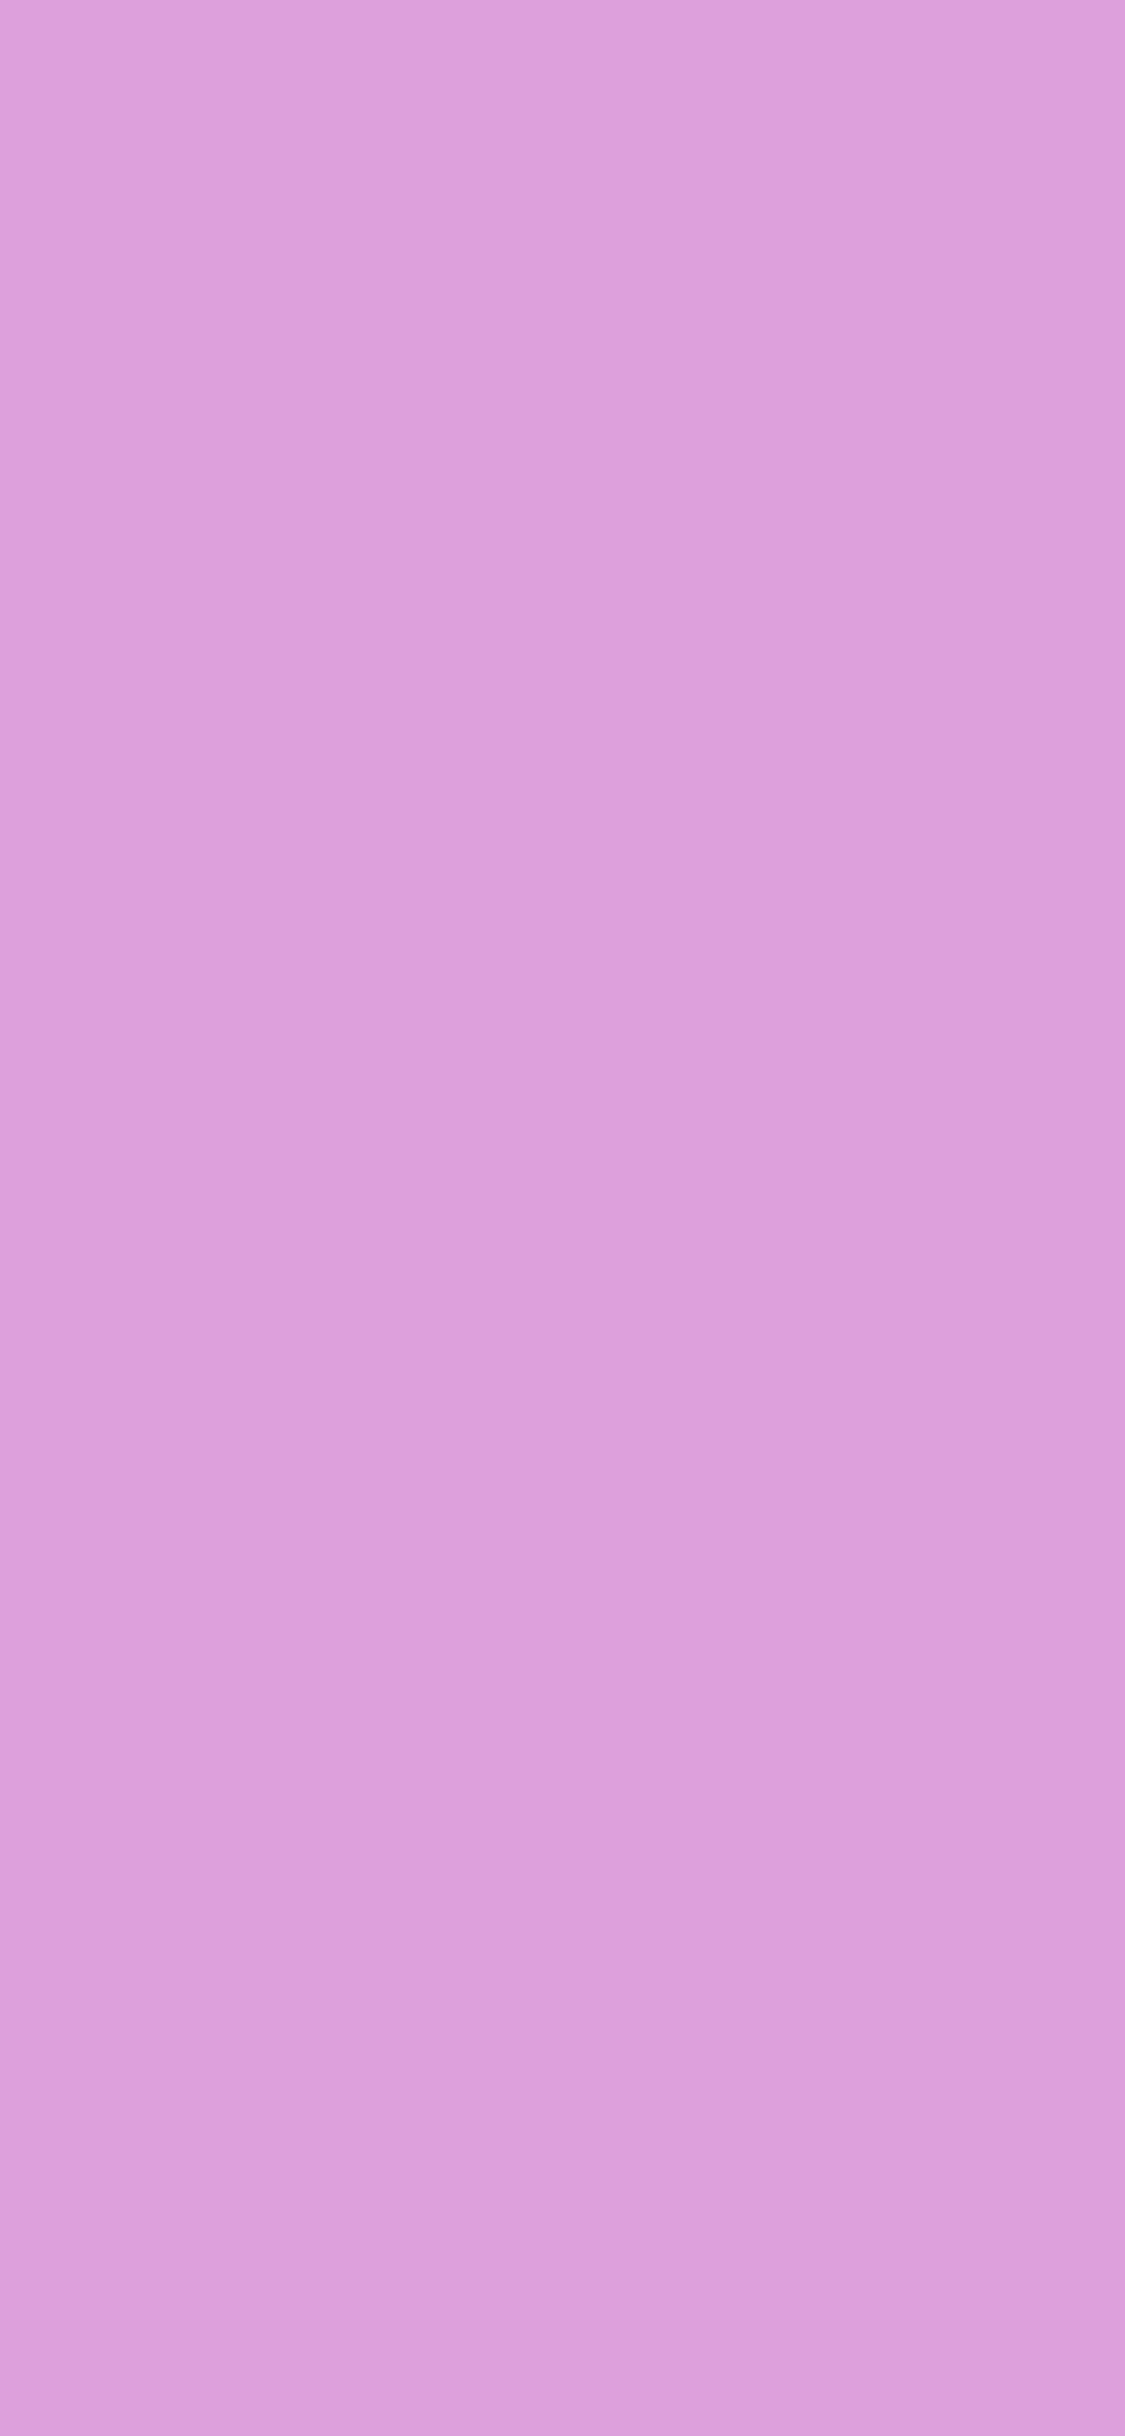 1125x2436 Plum Web Solid Color Background